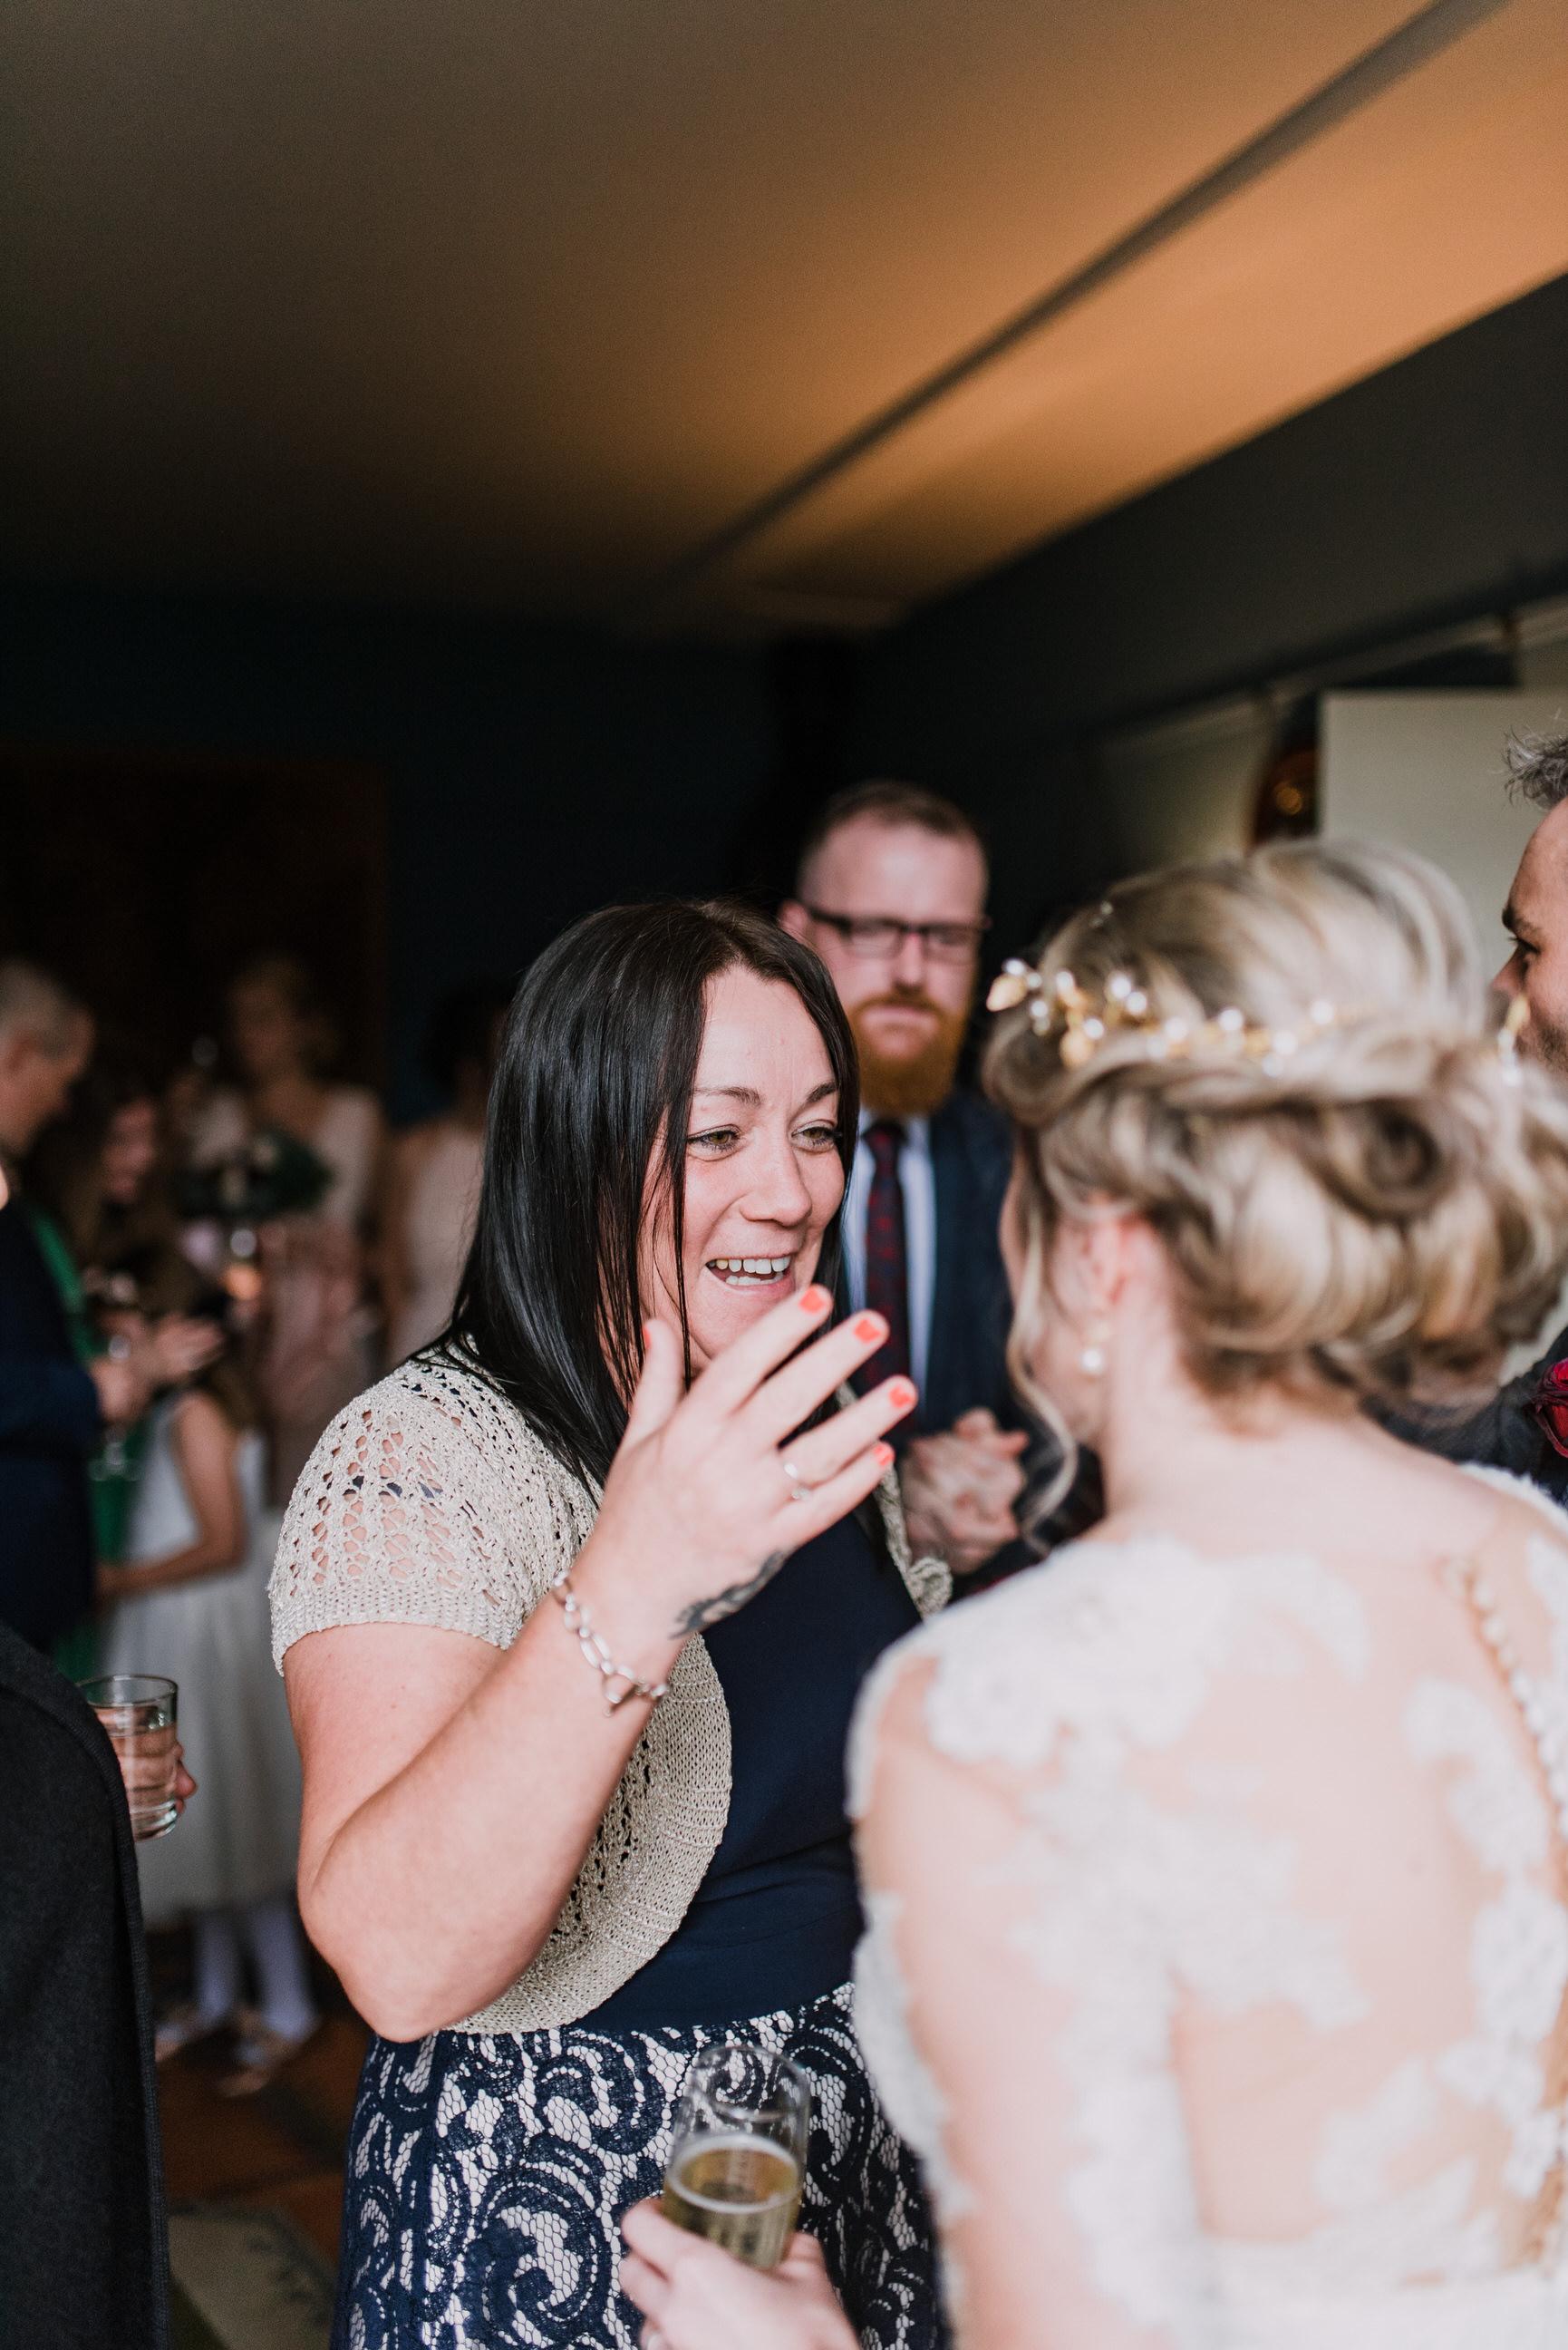 lissanoure castle wedding, northern ireland wedding photographer, romantic northern irish wedding venue, castle wedding ireland, natural wedding photography ni (70).jpg